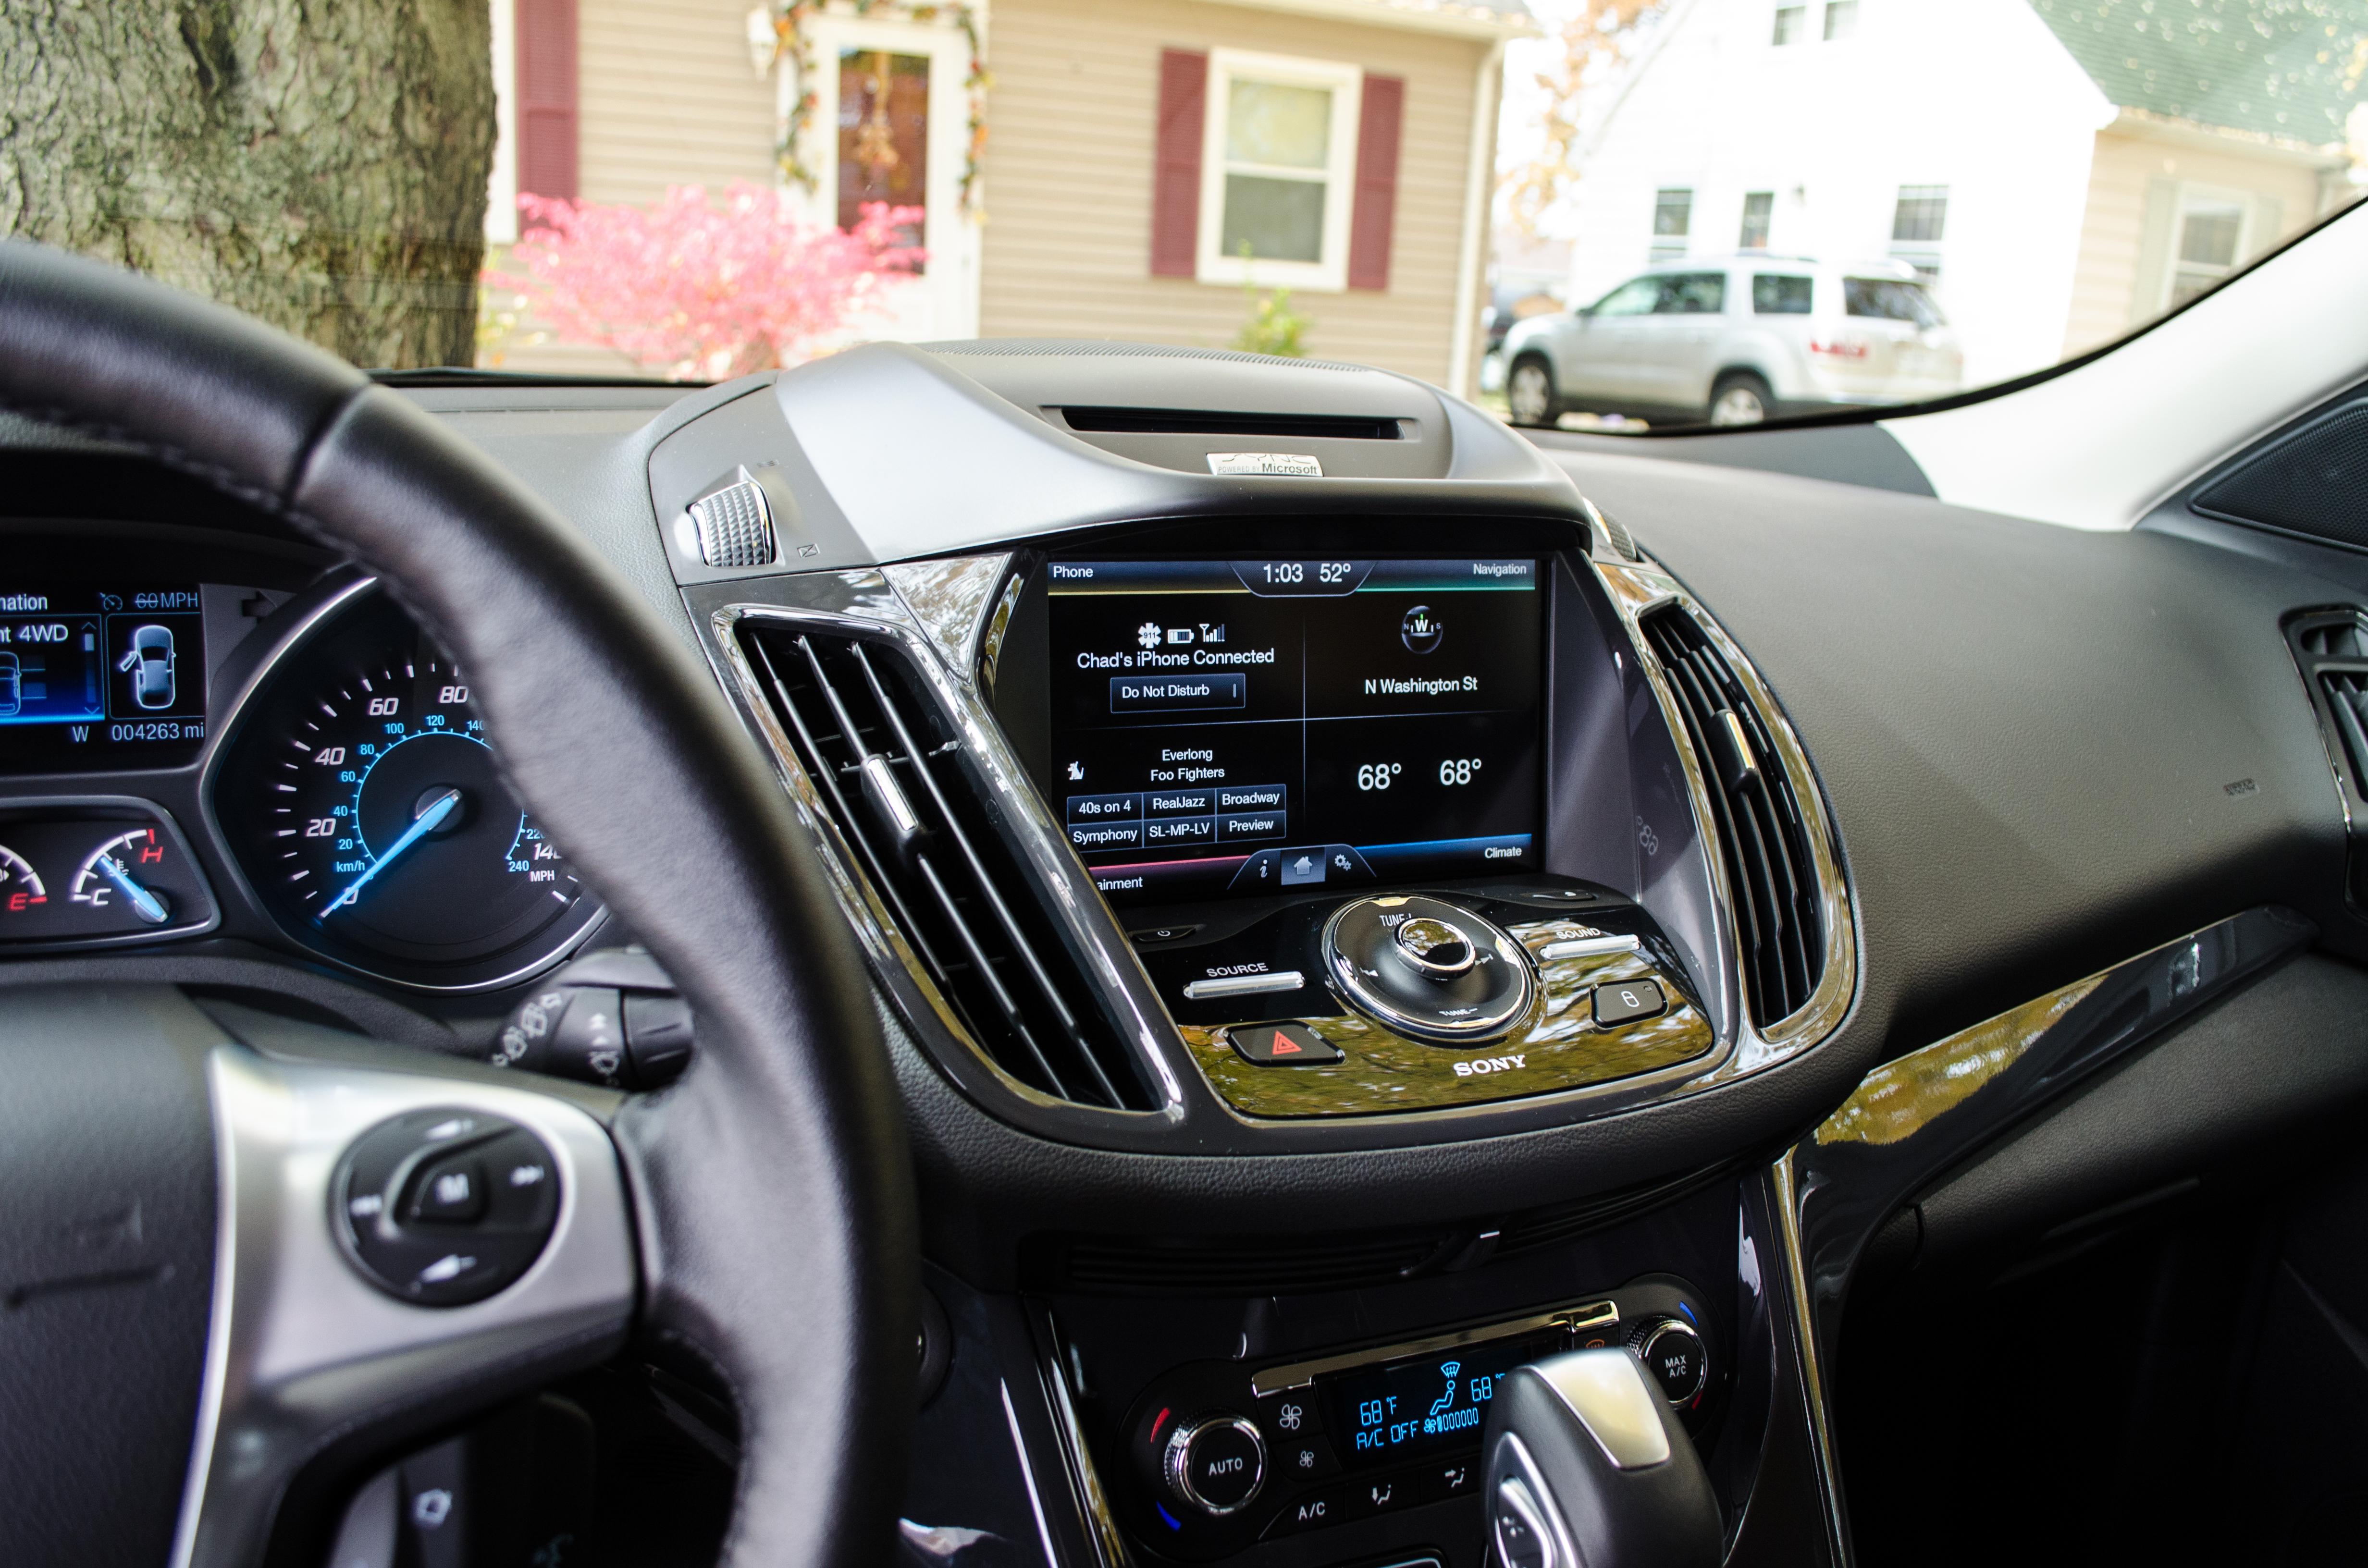 Direct Auto Sales >> 2014 Ford Escape Titanium (27 of 34) - Motor Review